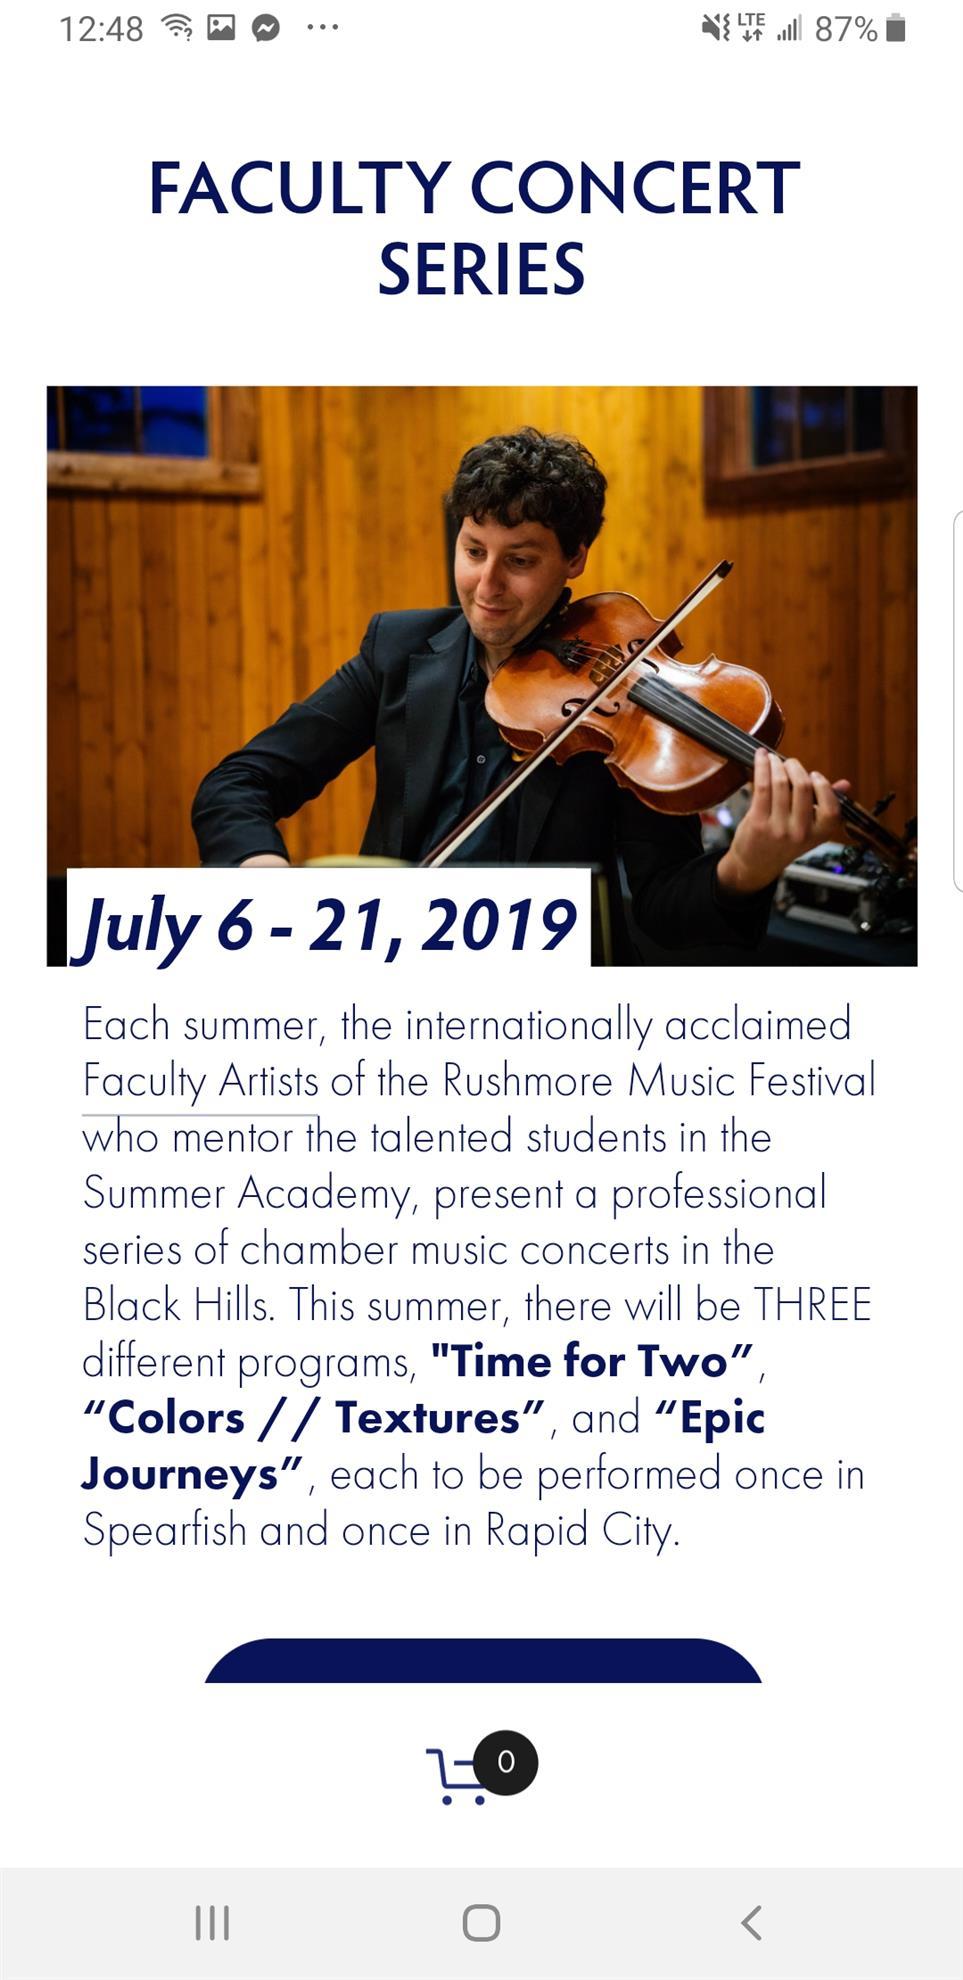 Rushmore Music Festival